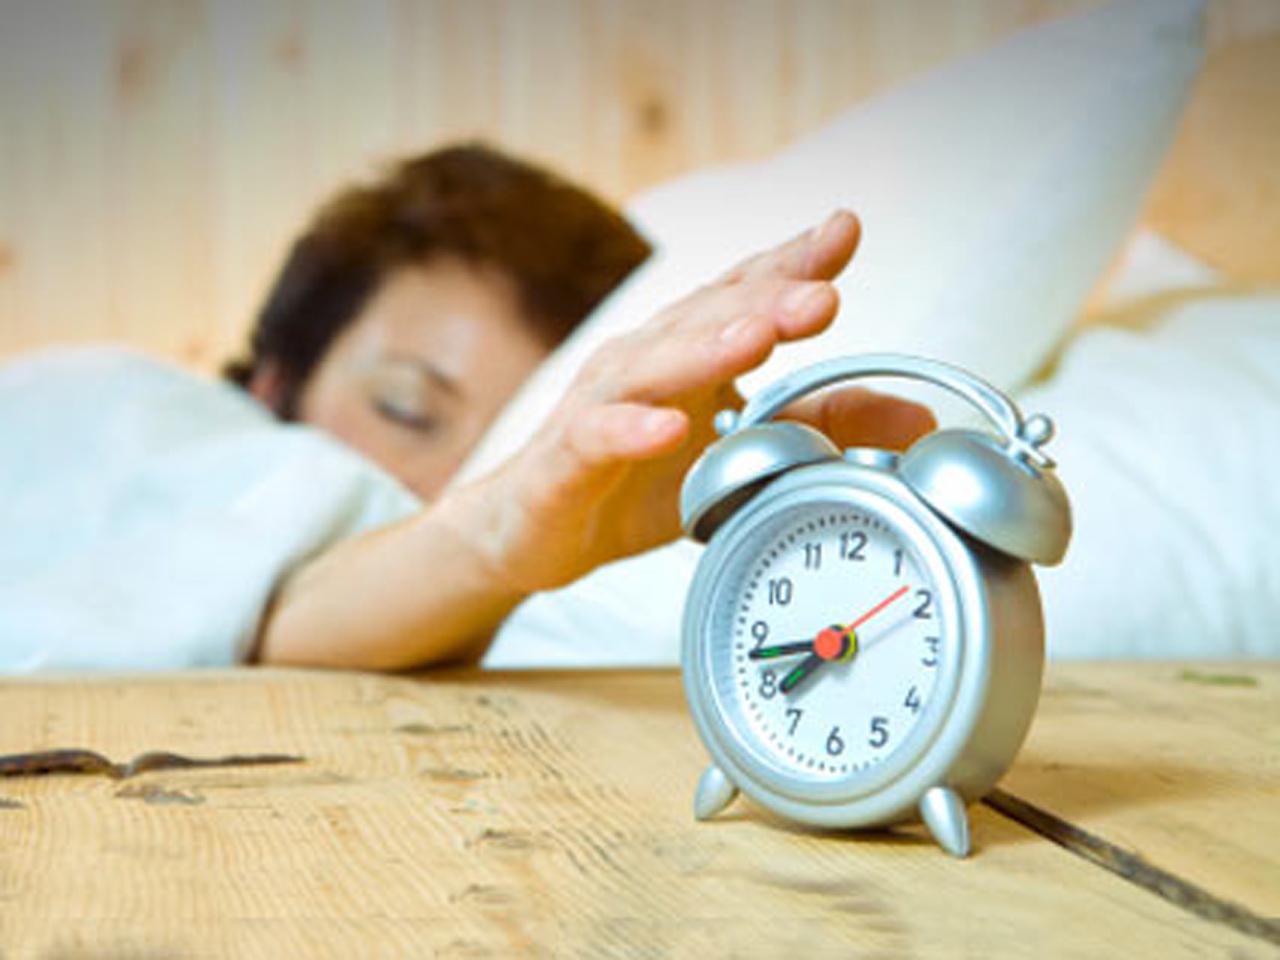 laser target alarm clock 10 offbeat alarm clocks to wake a heavy sleeper pictures cbs news. Black Bedroom Furniture Sets. Home Design Ideas